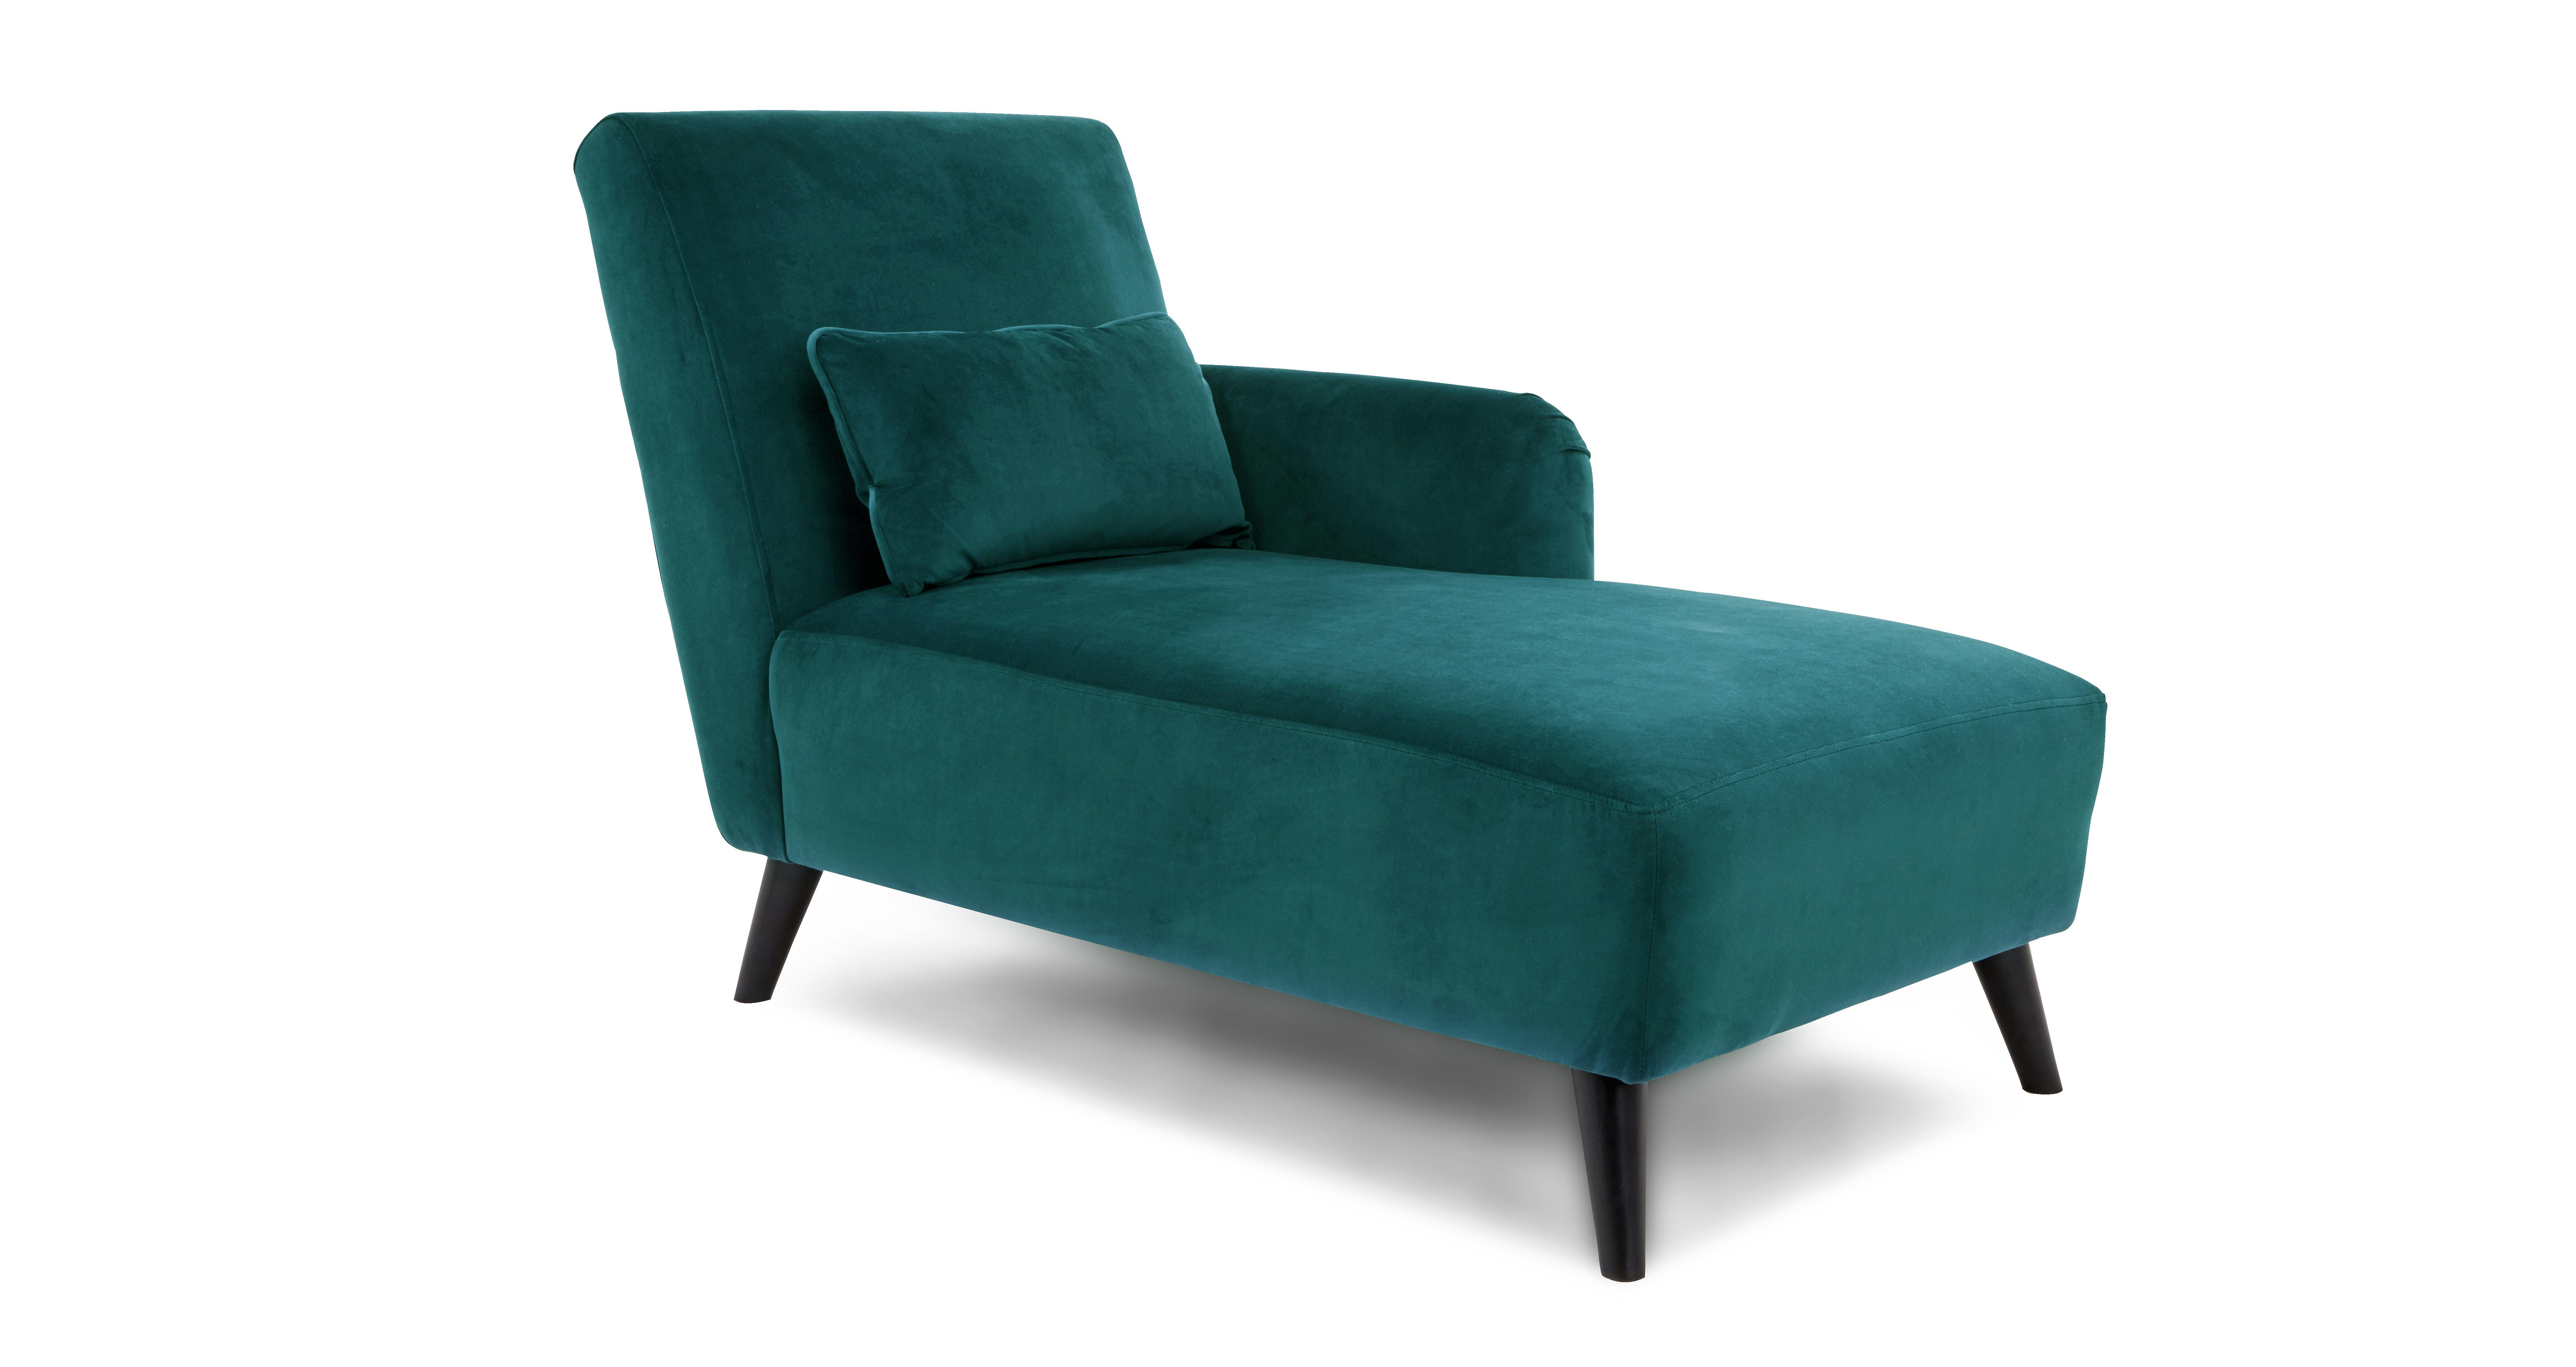 Evie right hand facing chaise longue velvet dfs ireland for Chaise longue ireland